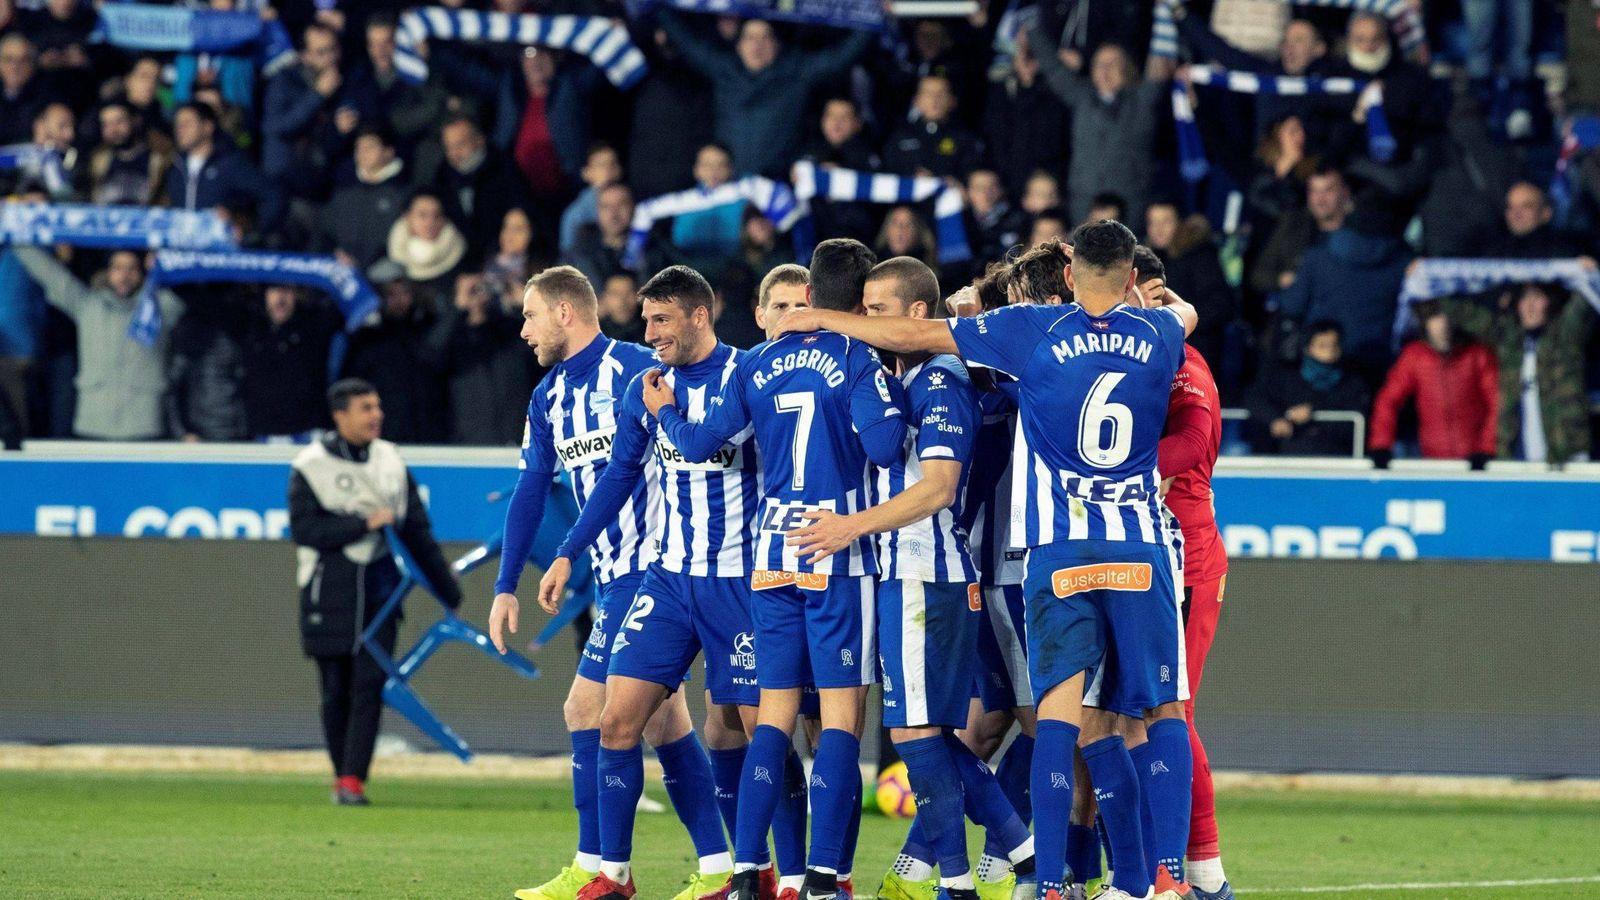 Foto: Jugadores del Alavés celebran un gol. (EFE)